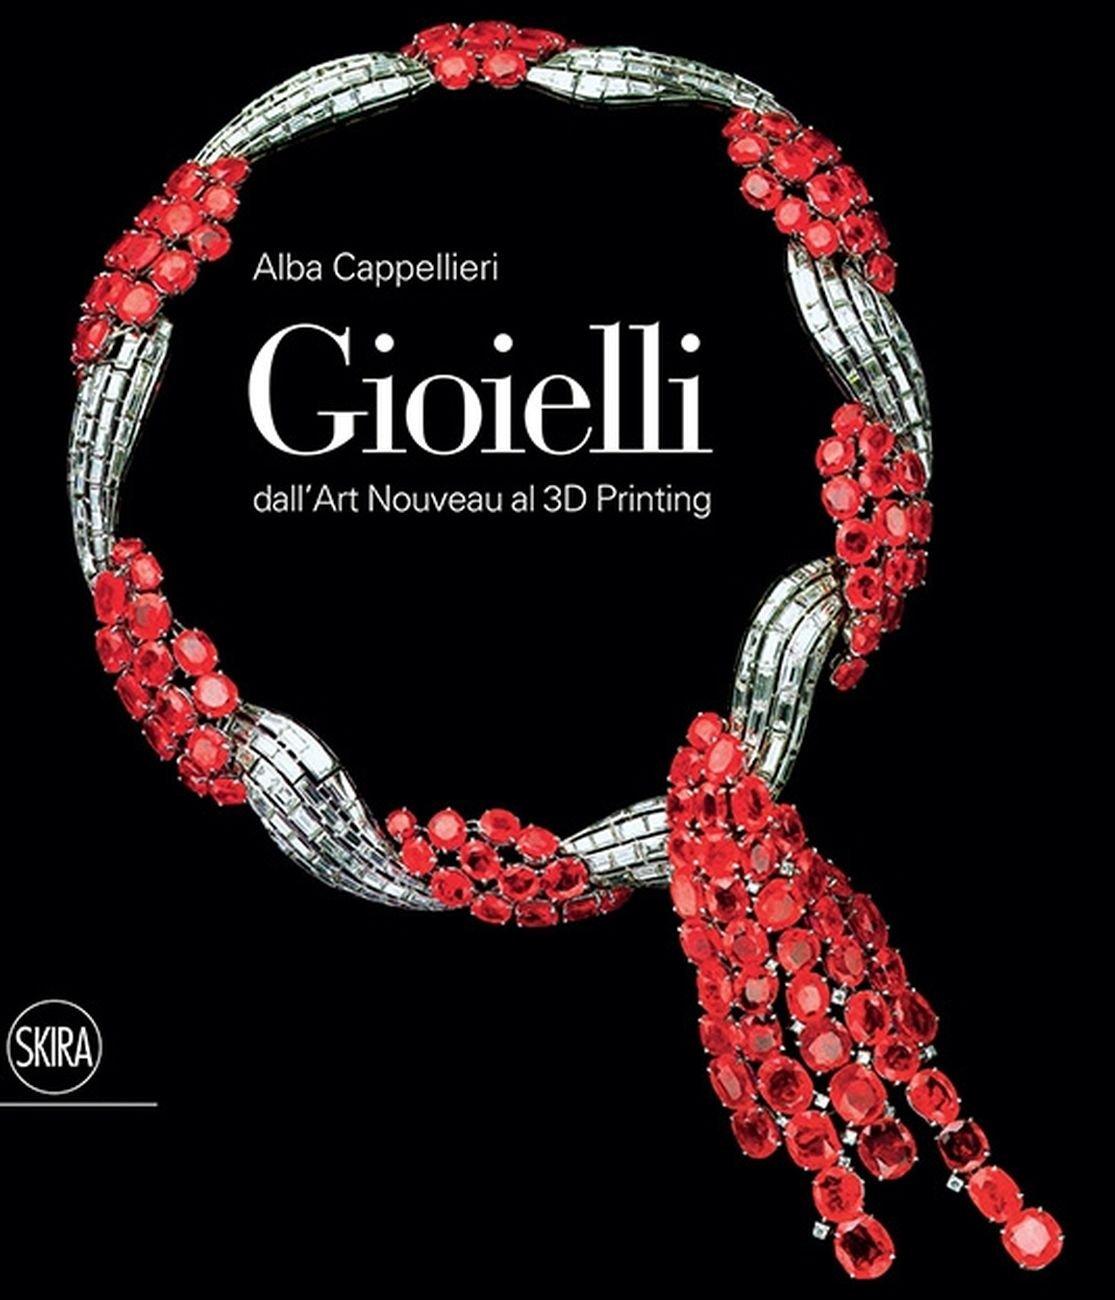 Alba Cappellieri – Gioielli. Dall'Art Noveau al 3D printing (Skira, Milano 2018)